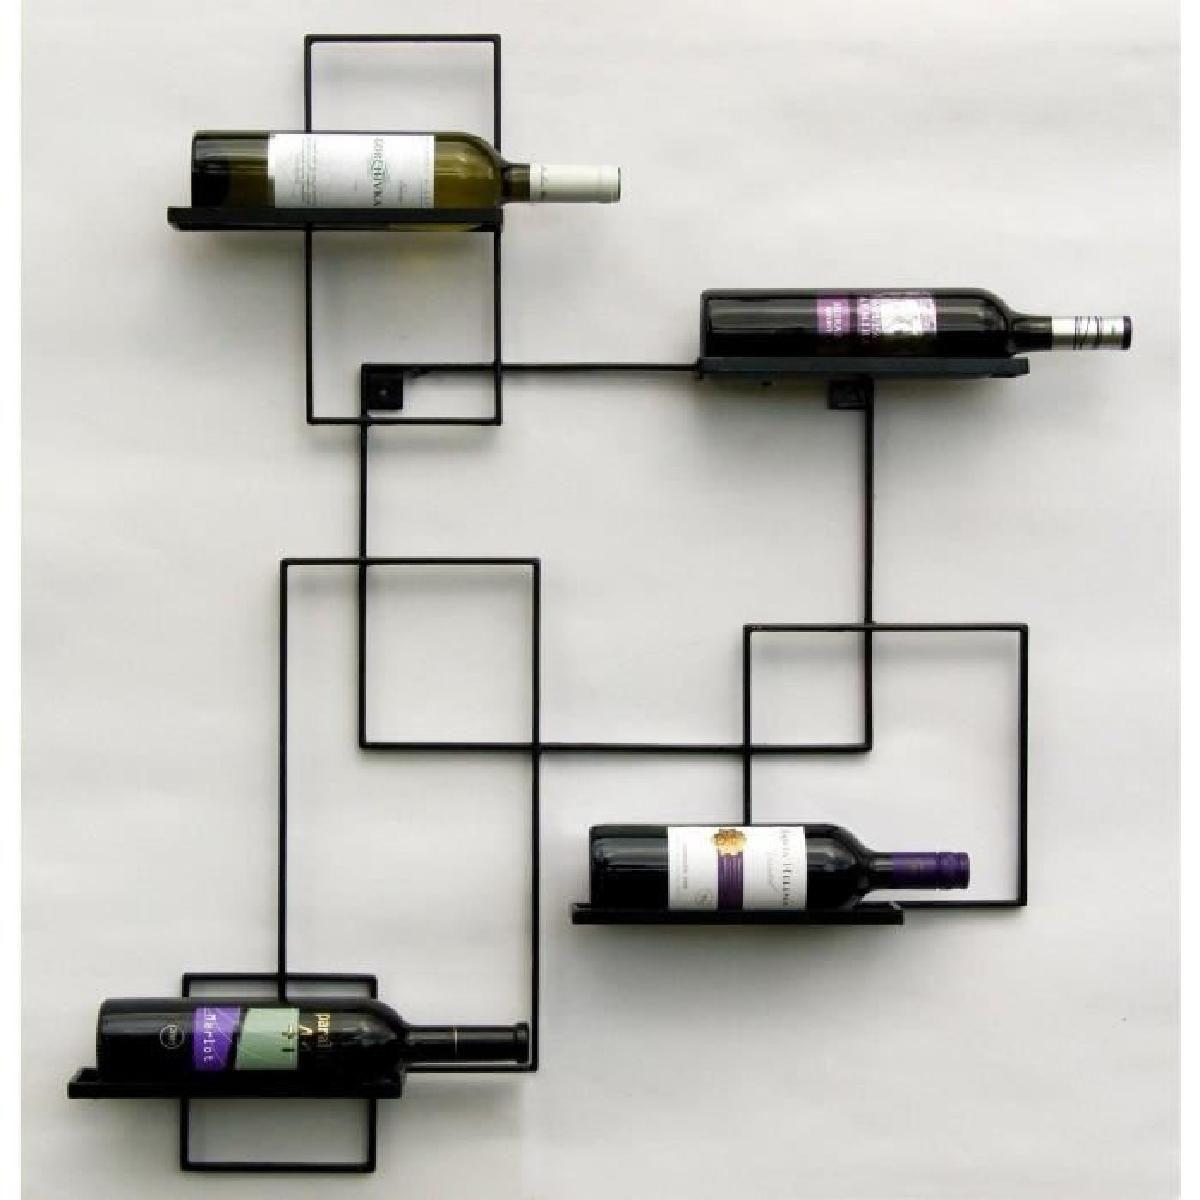 Porte bouteille mural design - Porte bouteille mural design ...